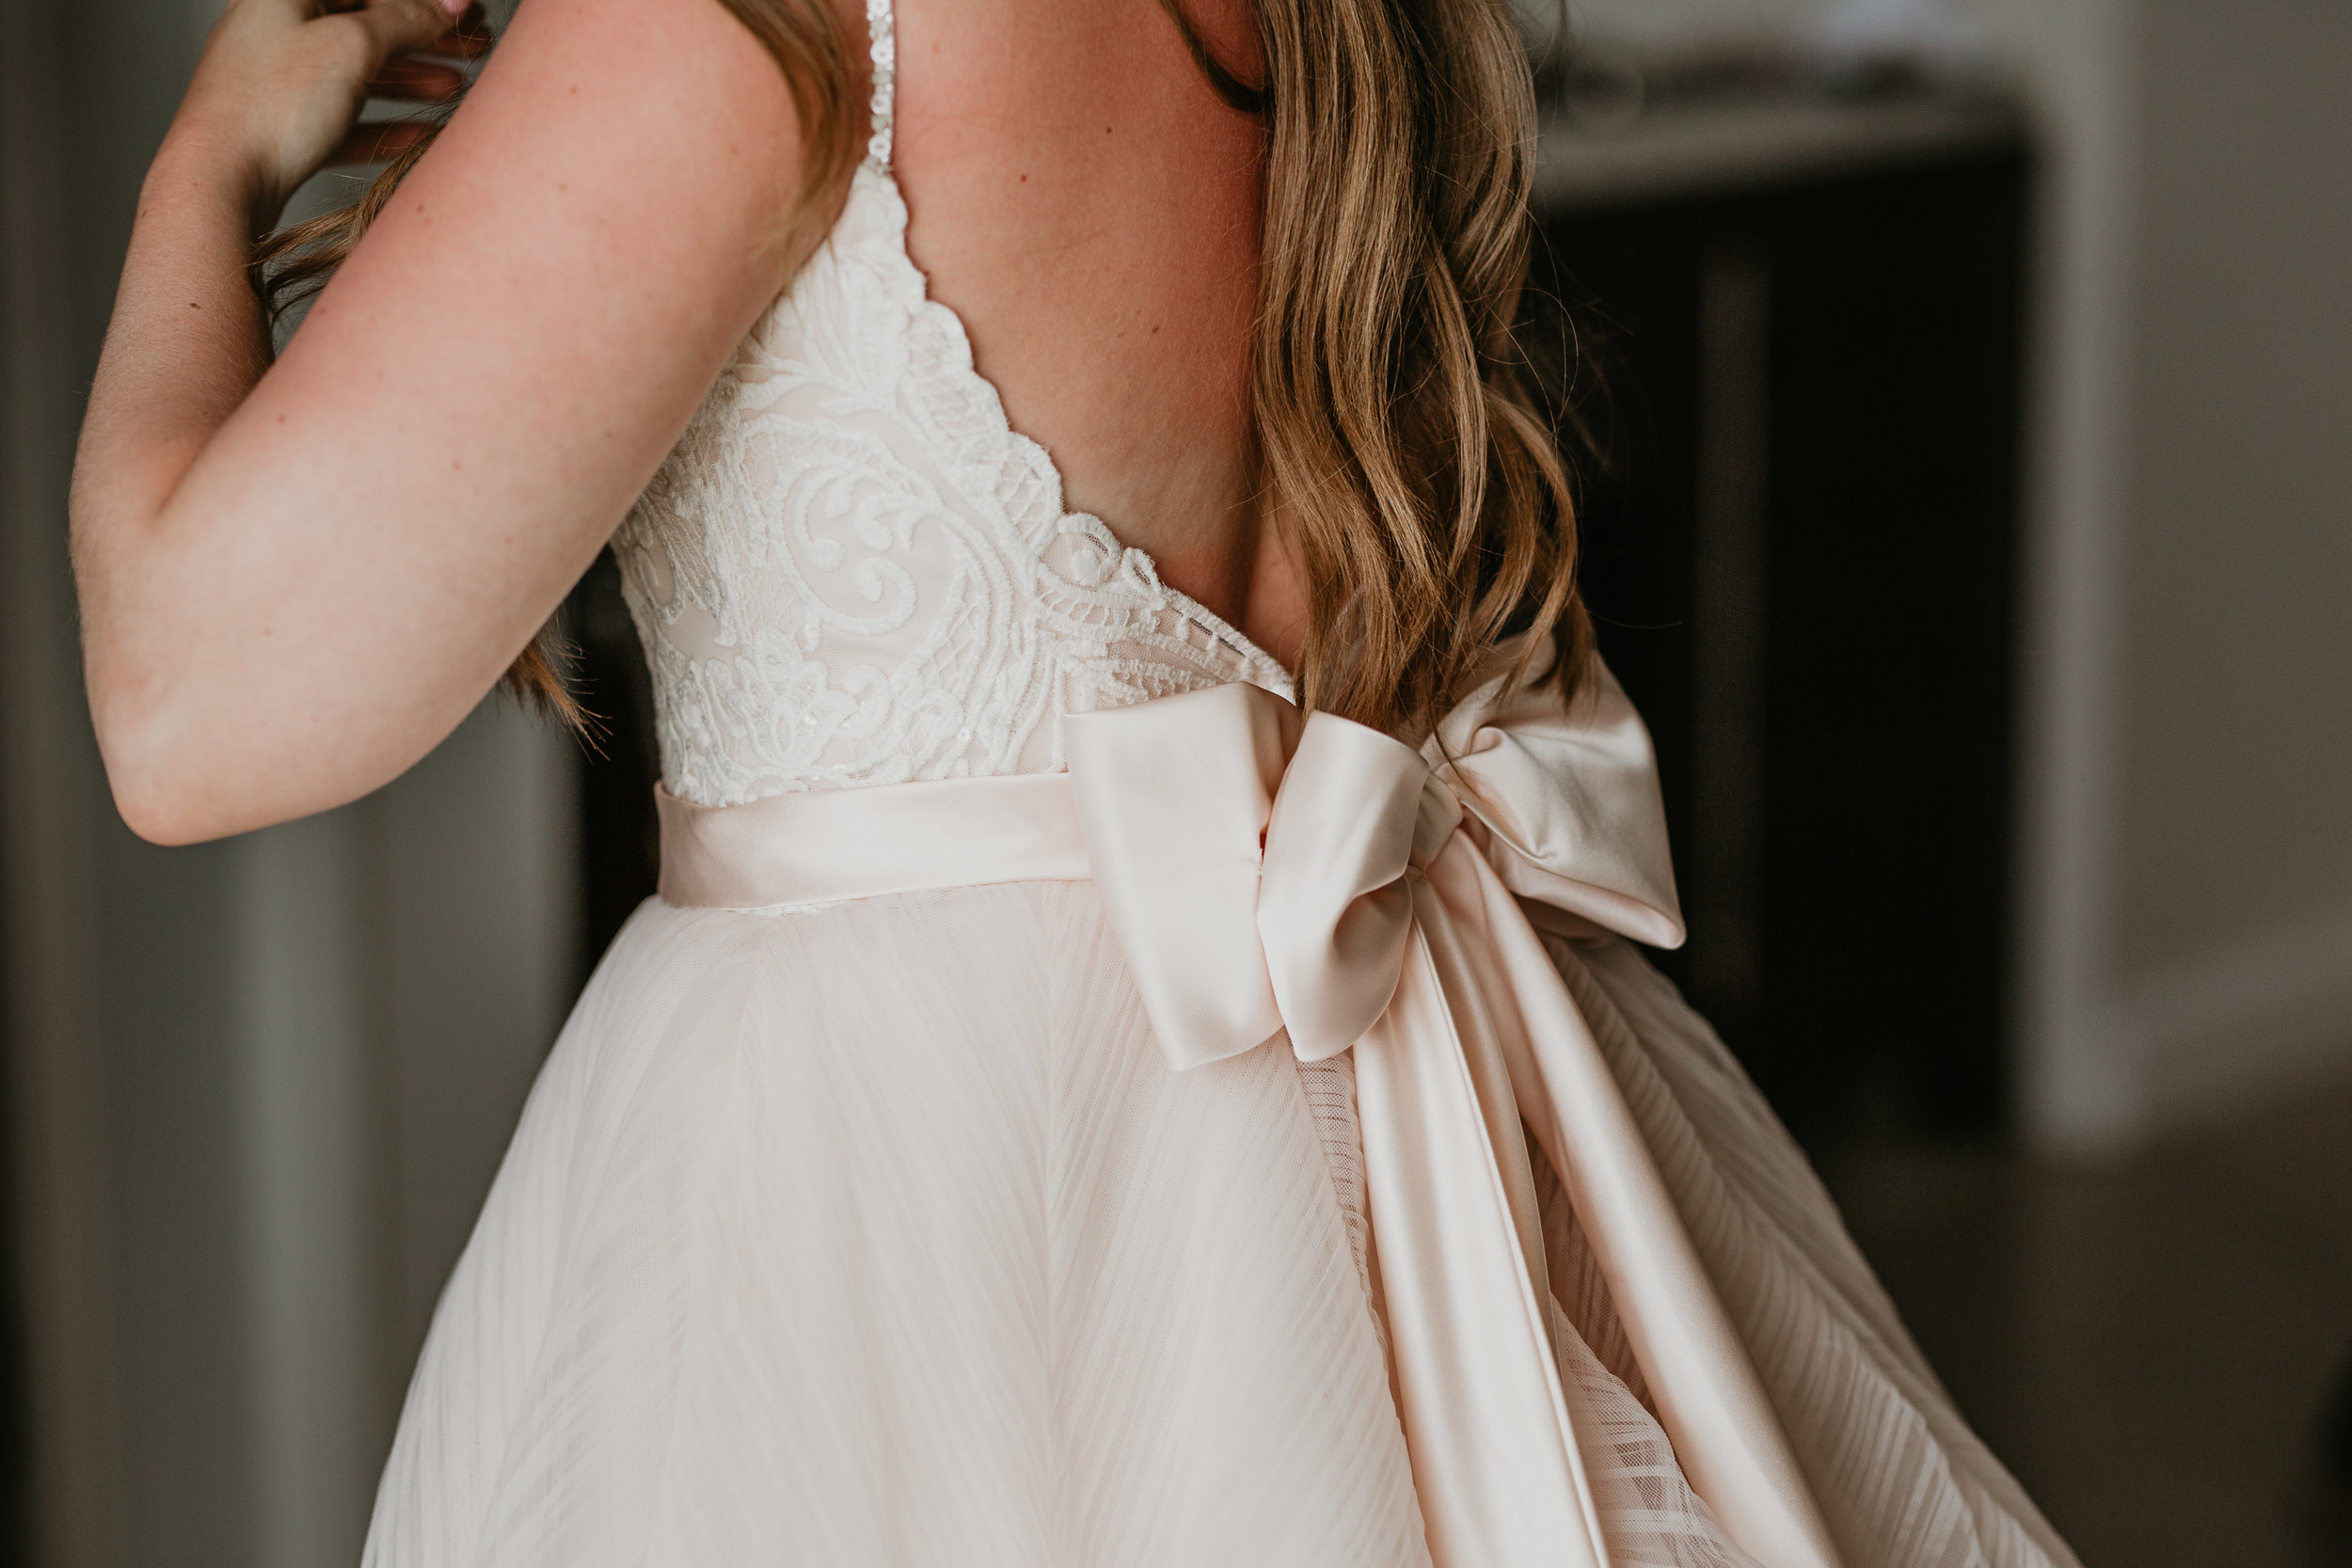 nicole-daacke-photography-destination-wedding-in-st-lucia-sandals-la-toc-intimate-island-wedding-carribean-elopement-photographer-chill-island-wedding-20.jpg